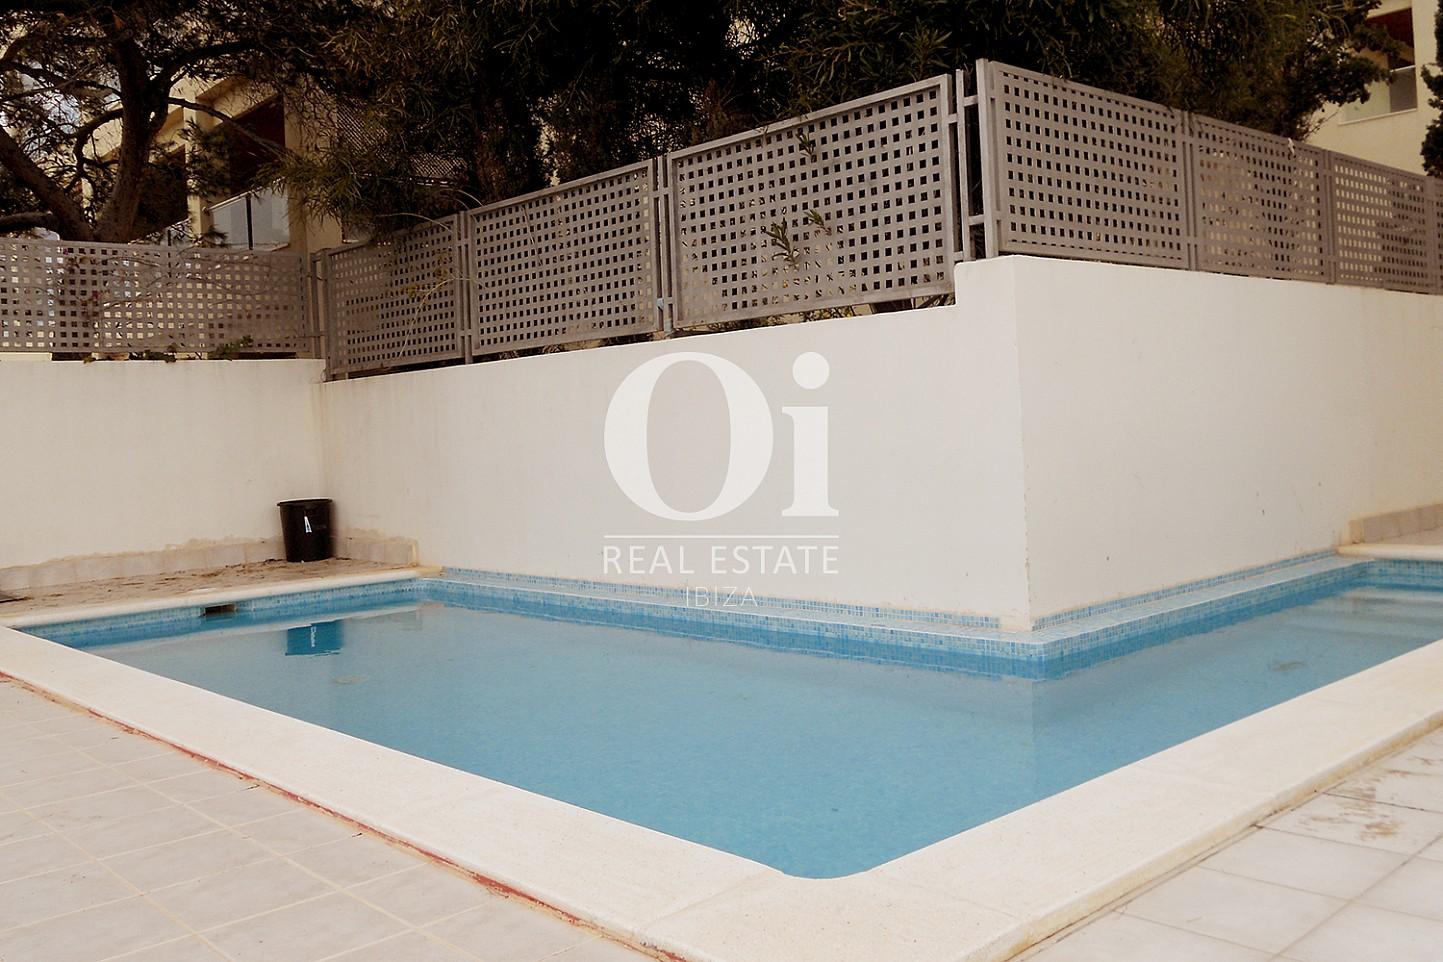 Piscina de piso en venta en Cala Gració, zona de Sant Antoni, Ibiza